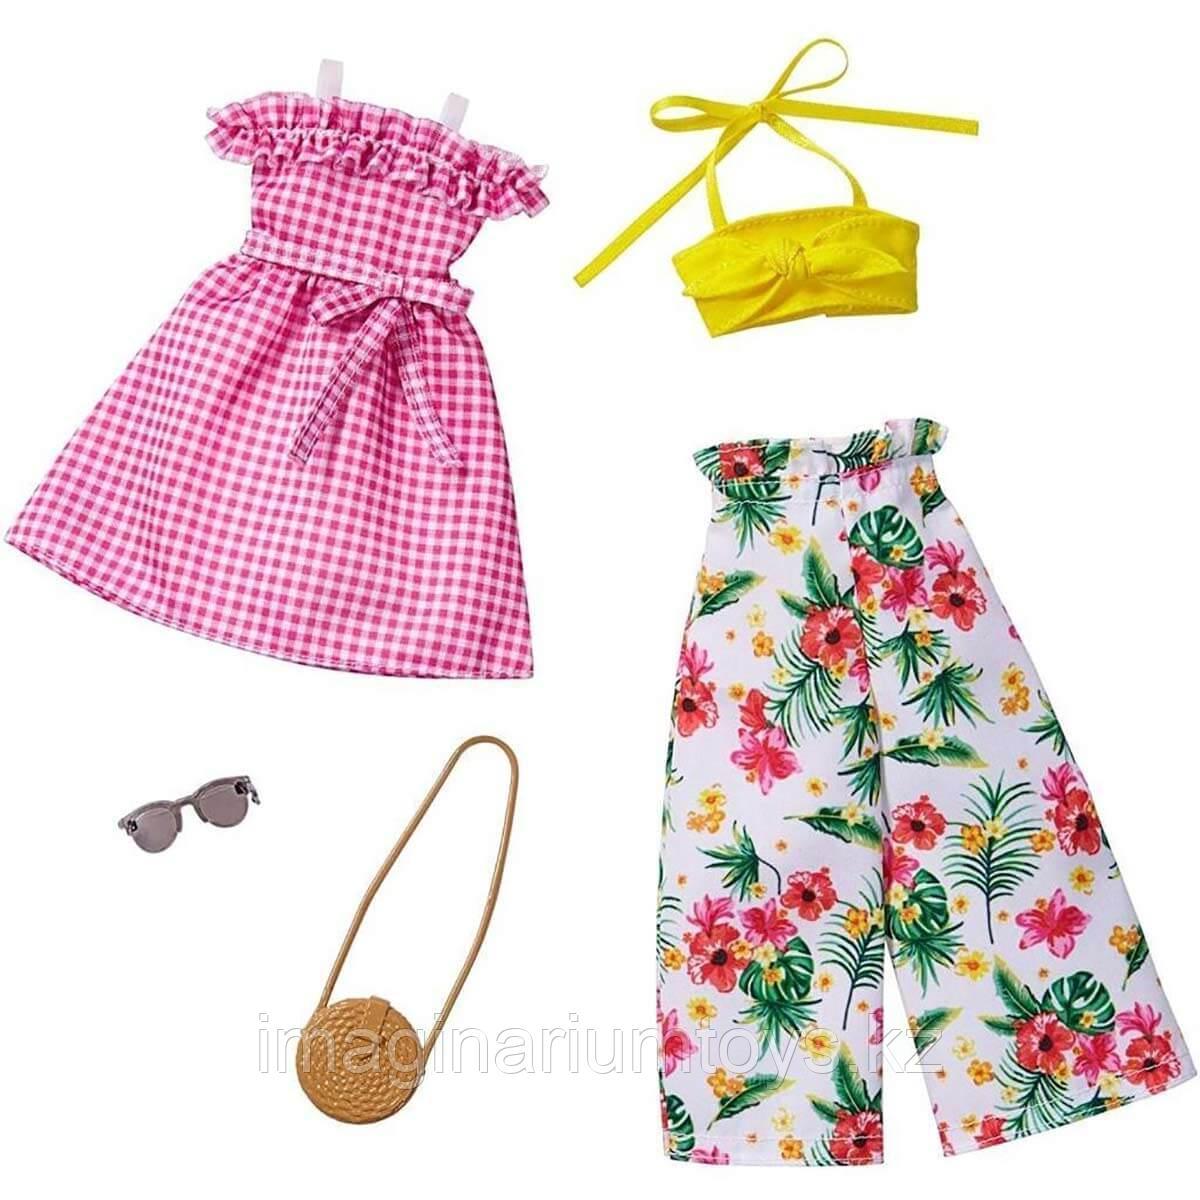 Летняя одежда для куклы Барби новинка 2020 FYW84